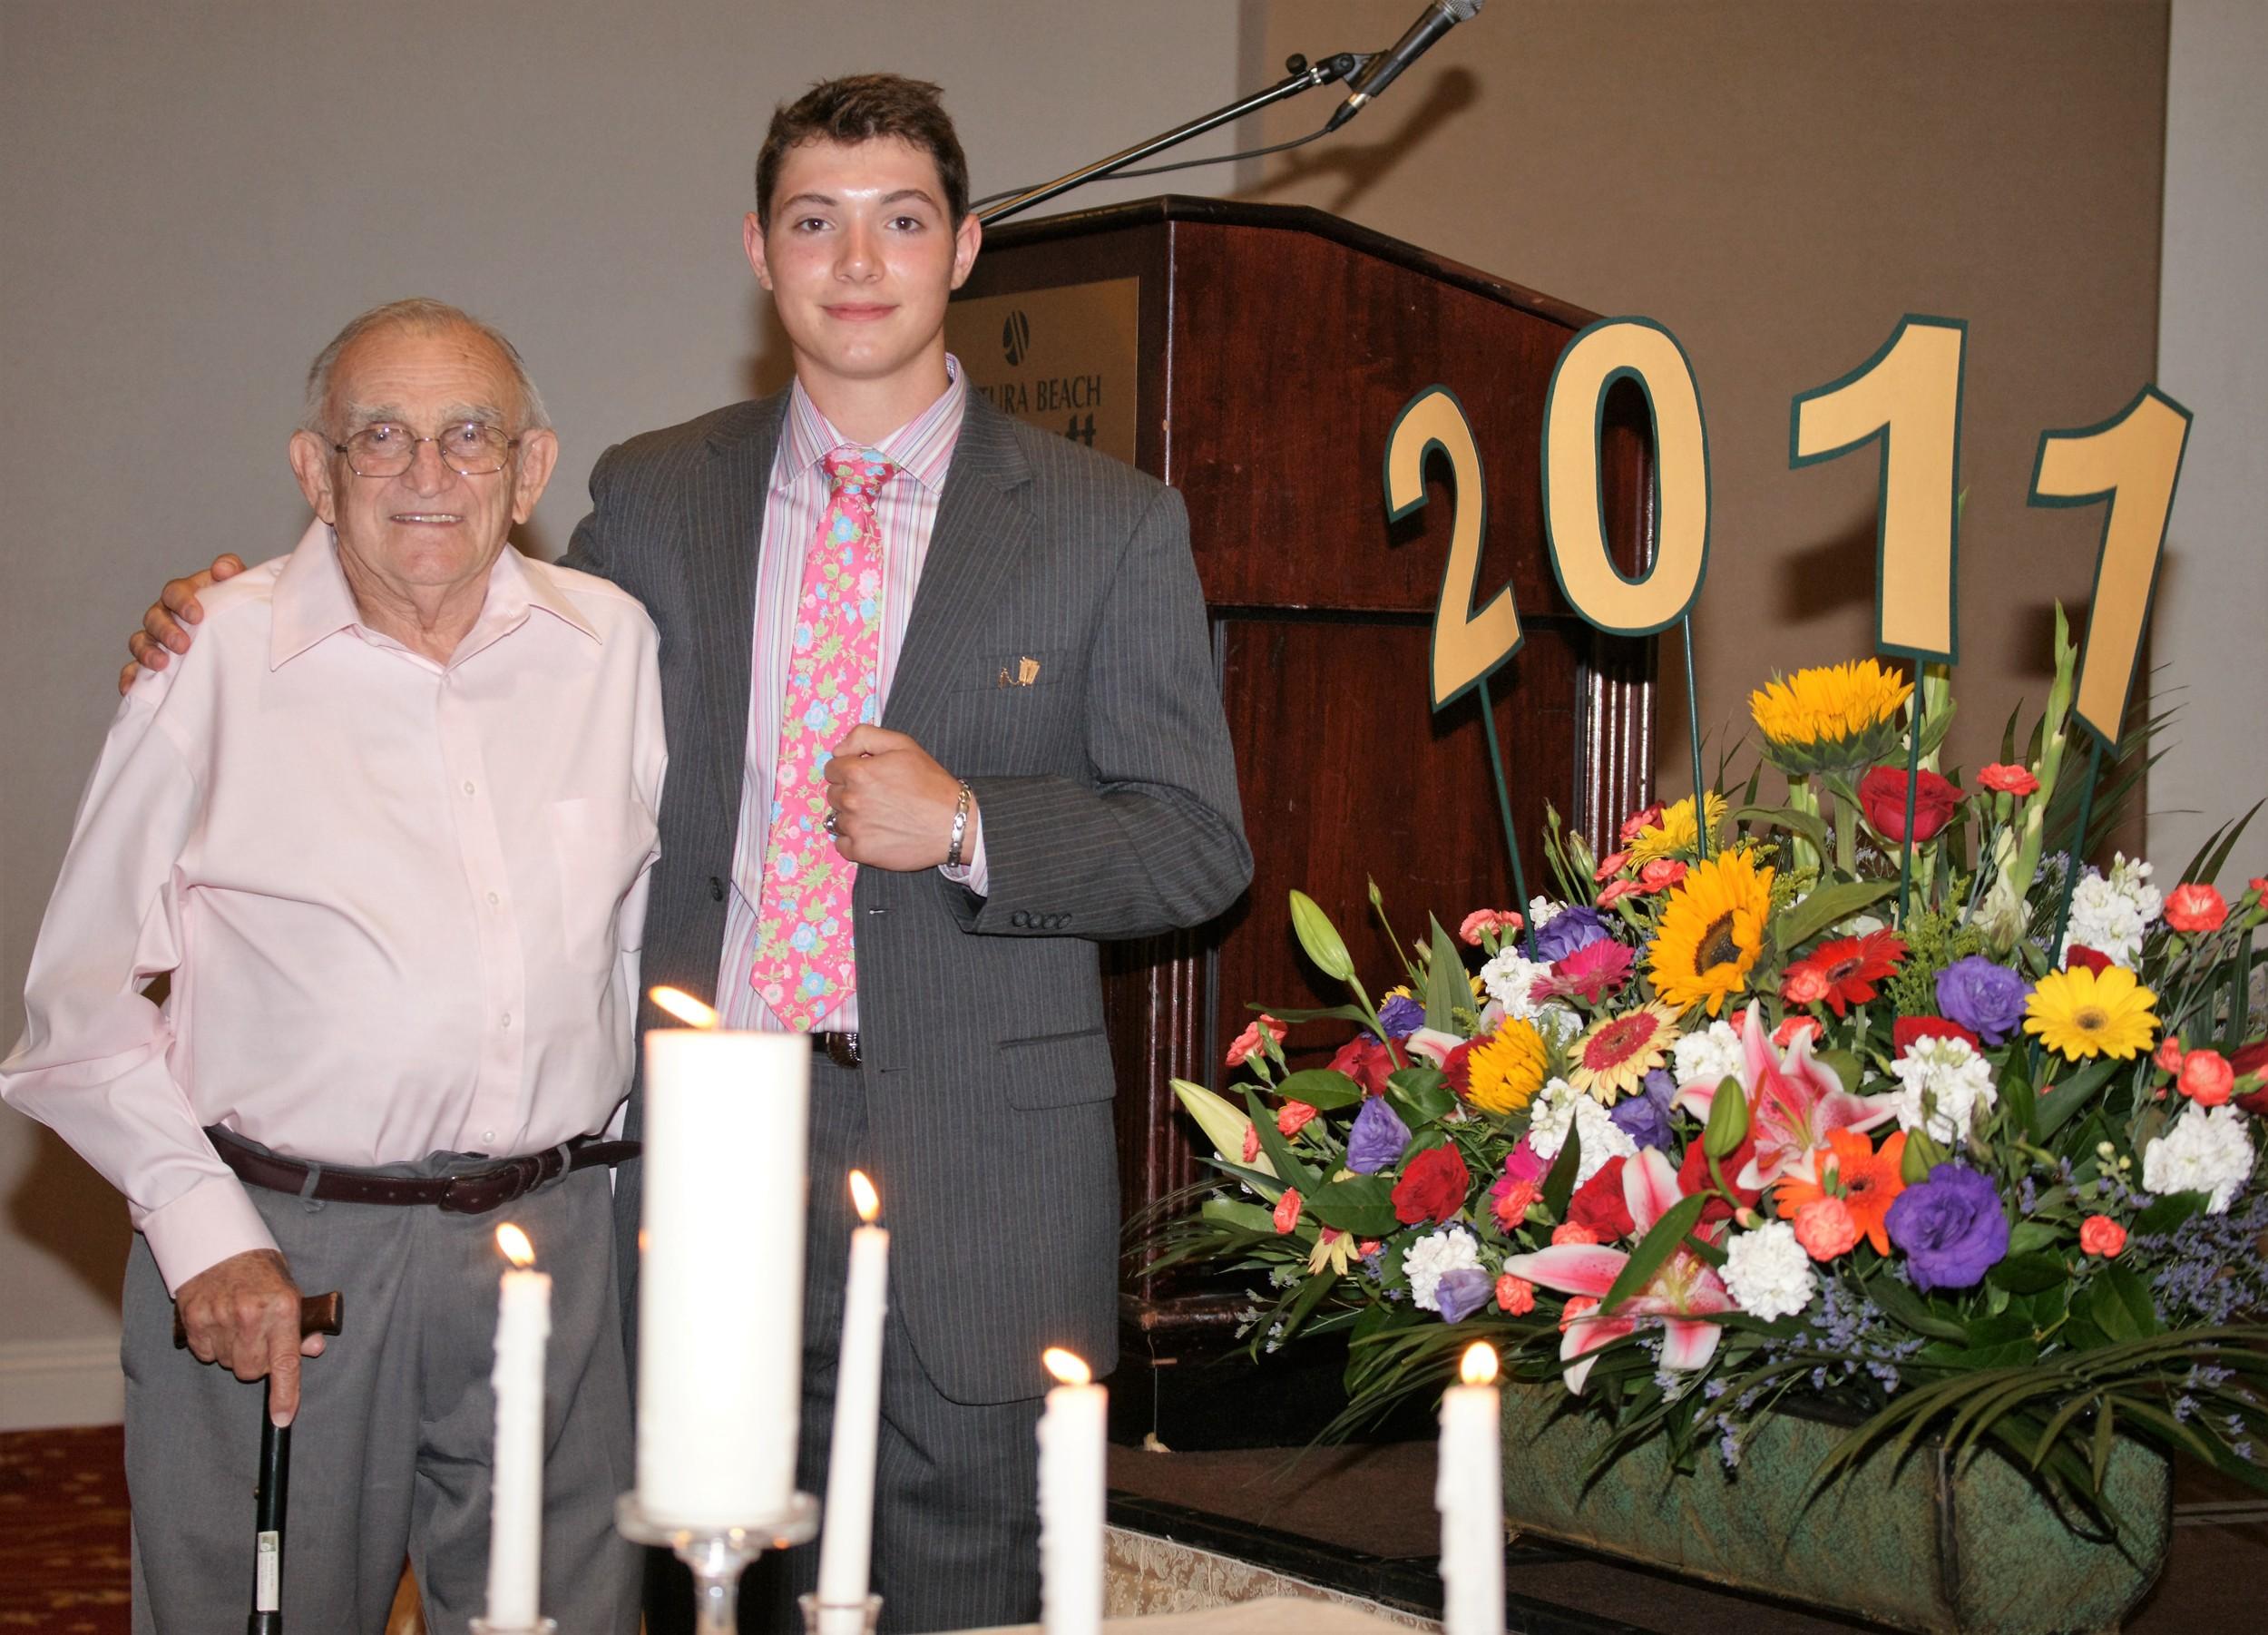 With Grandpa at High School Graduation